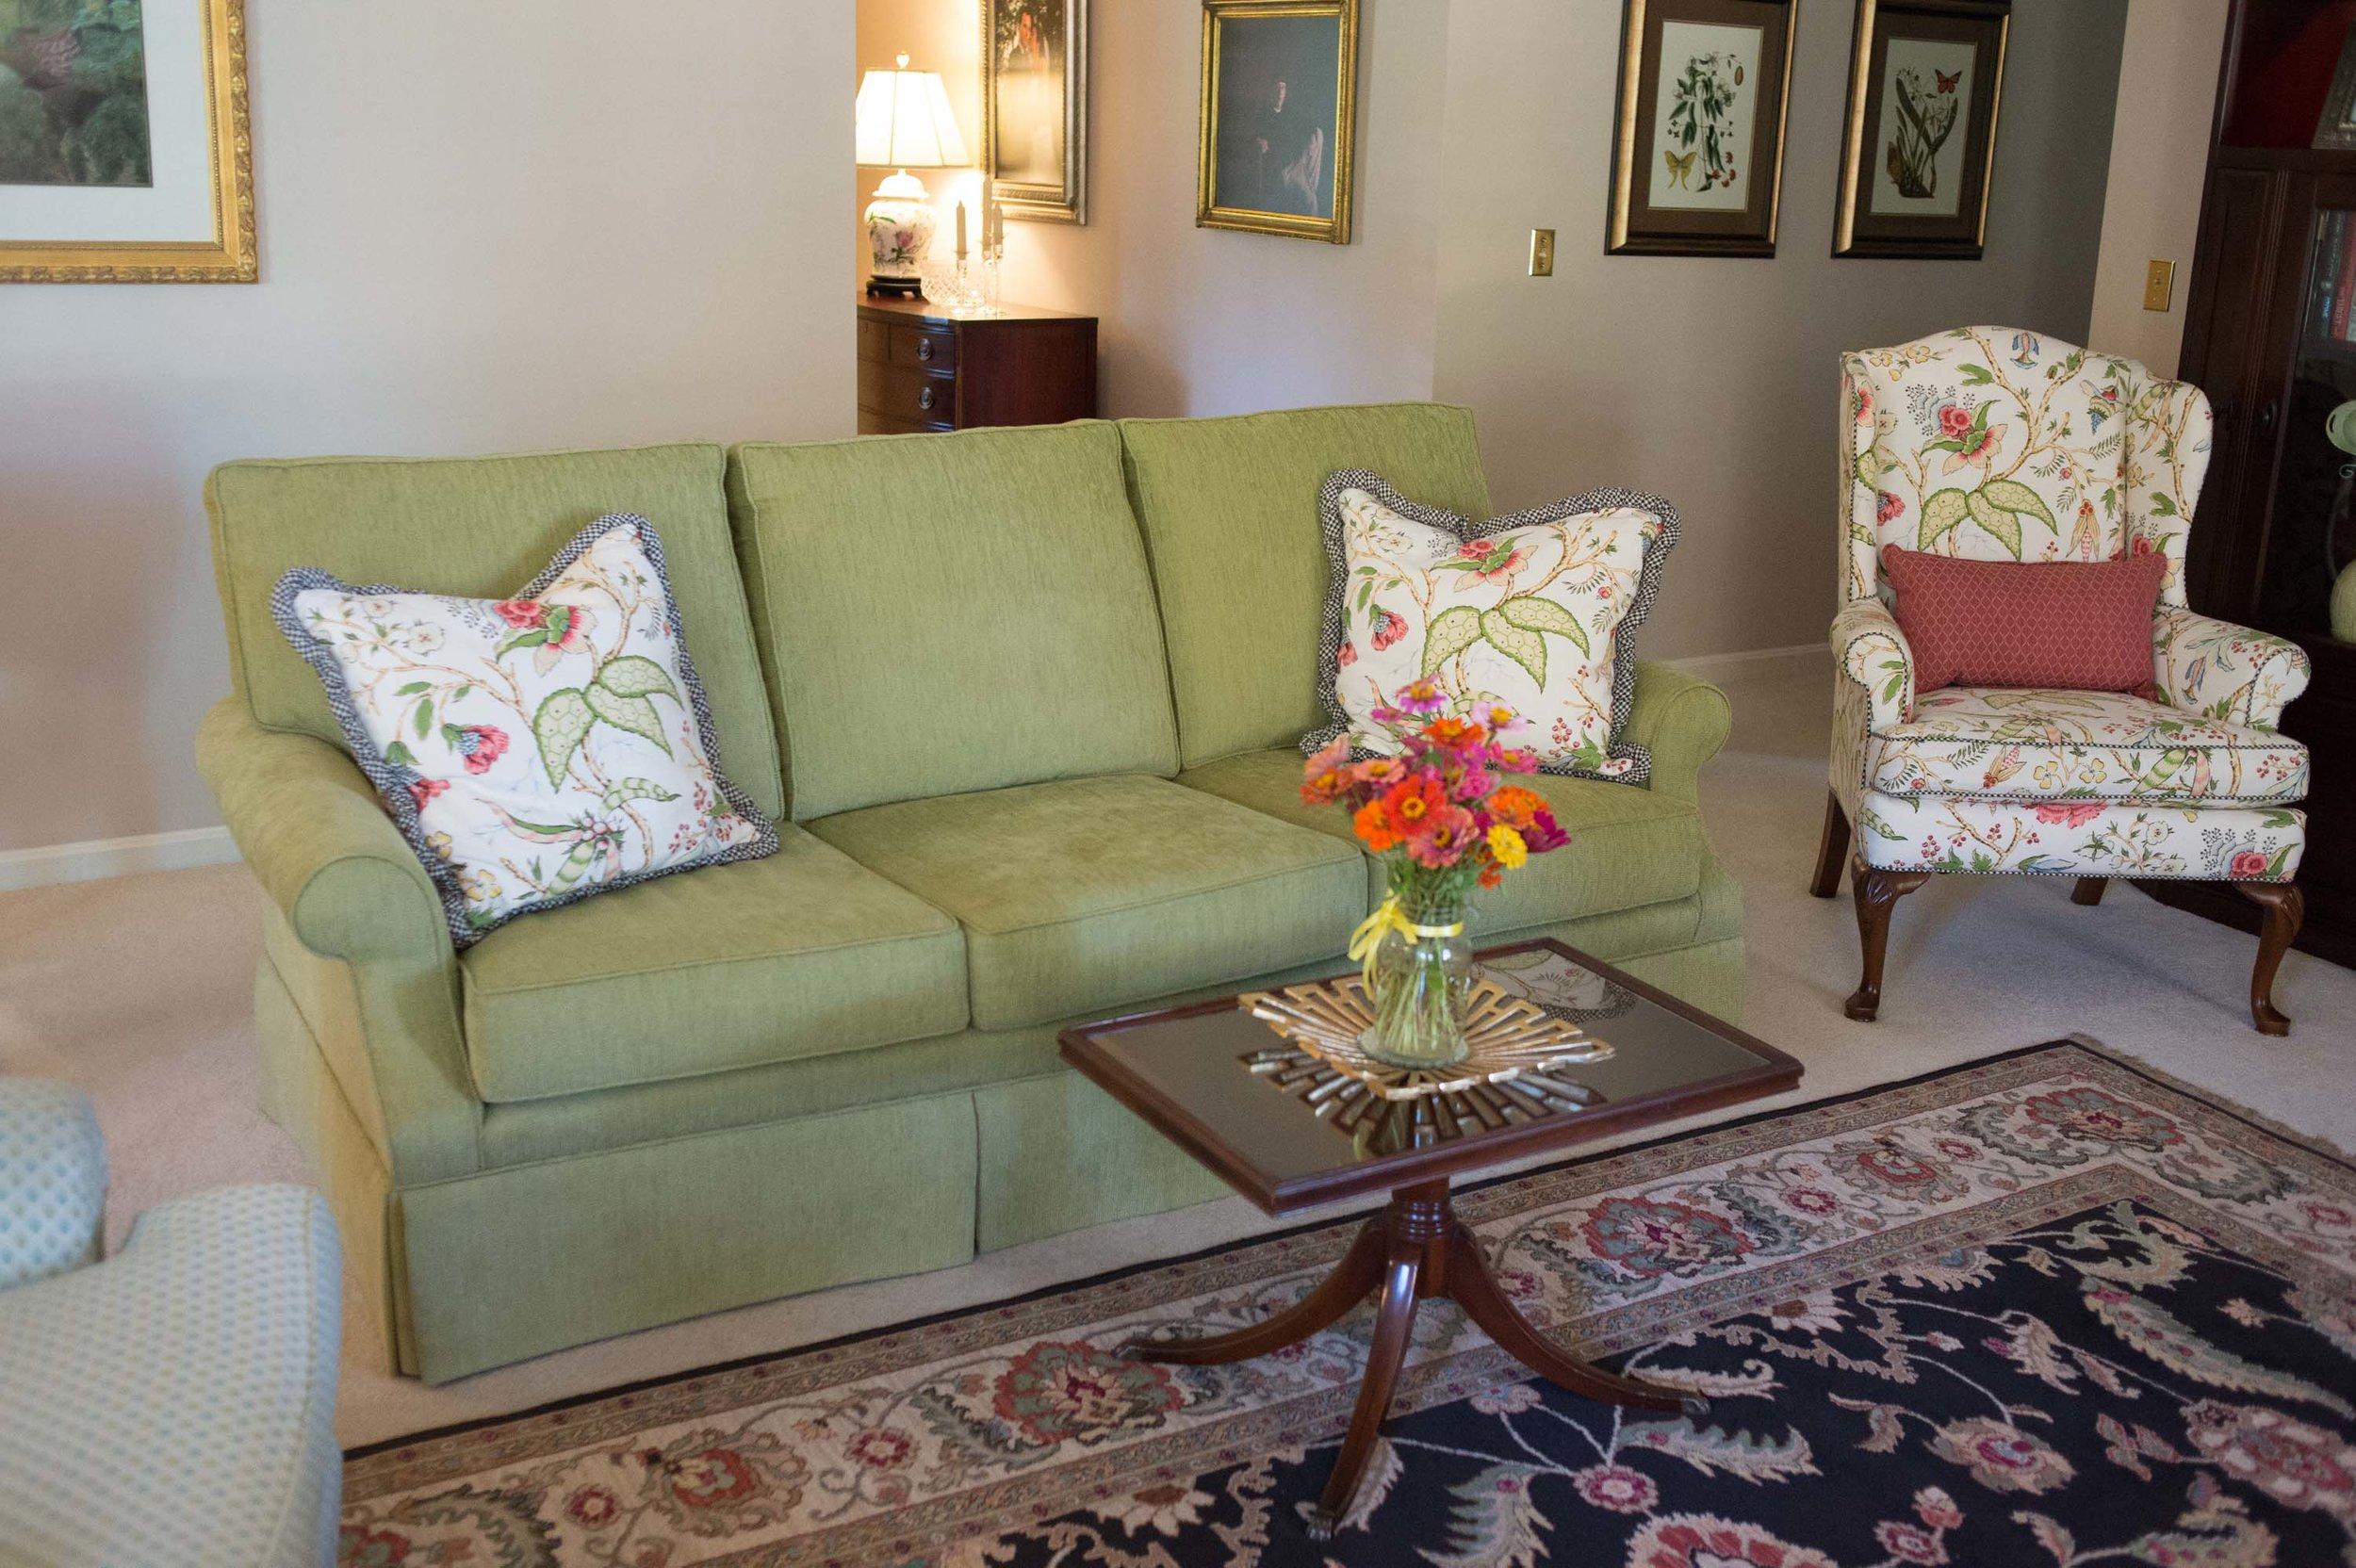 Living Room Sofa, Printed Pillows, Large Area Rug, Fresh Flowers & Coffee Table